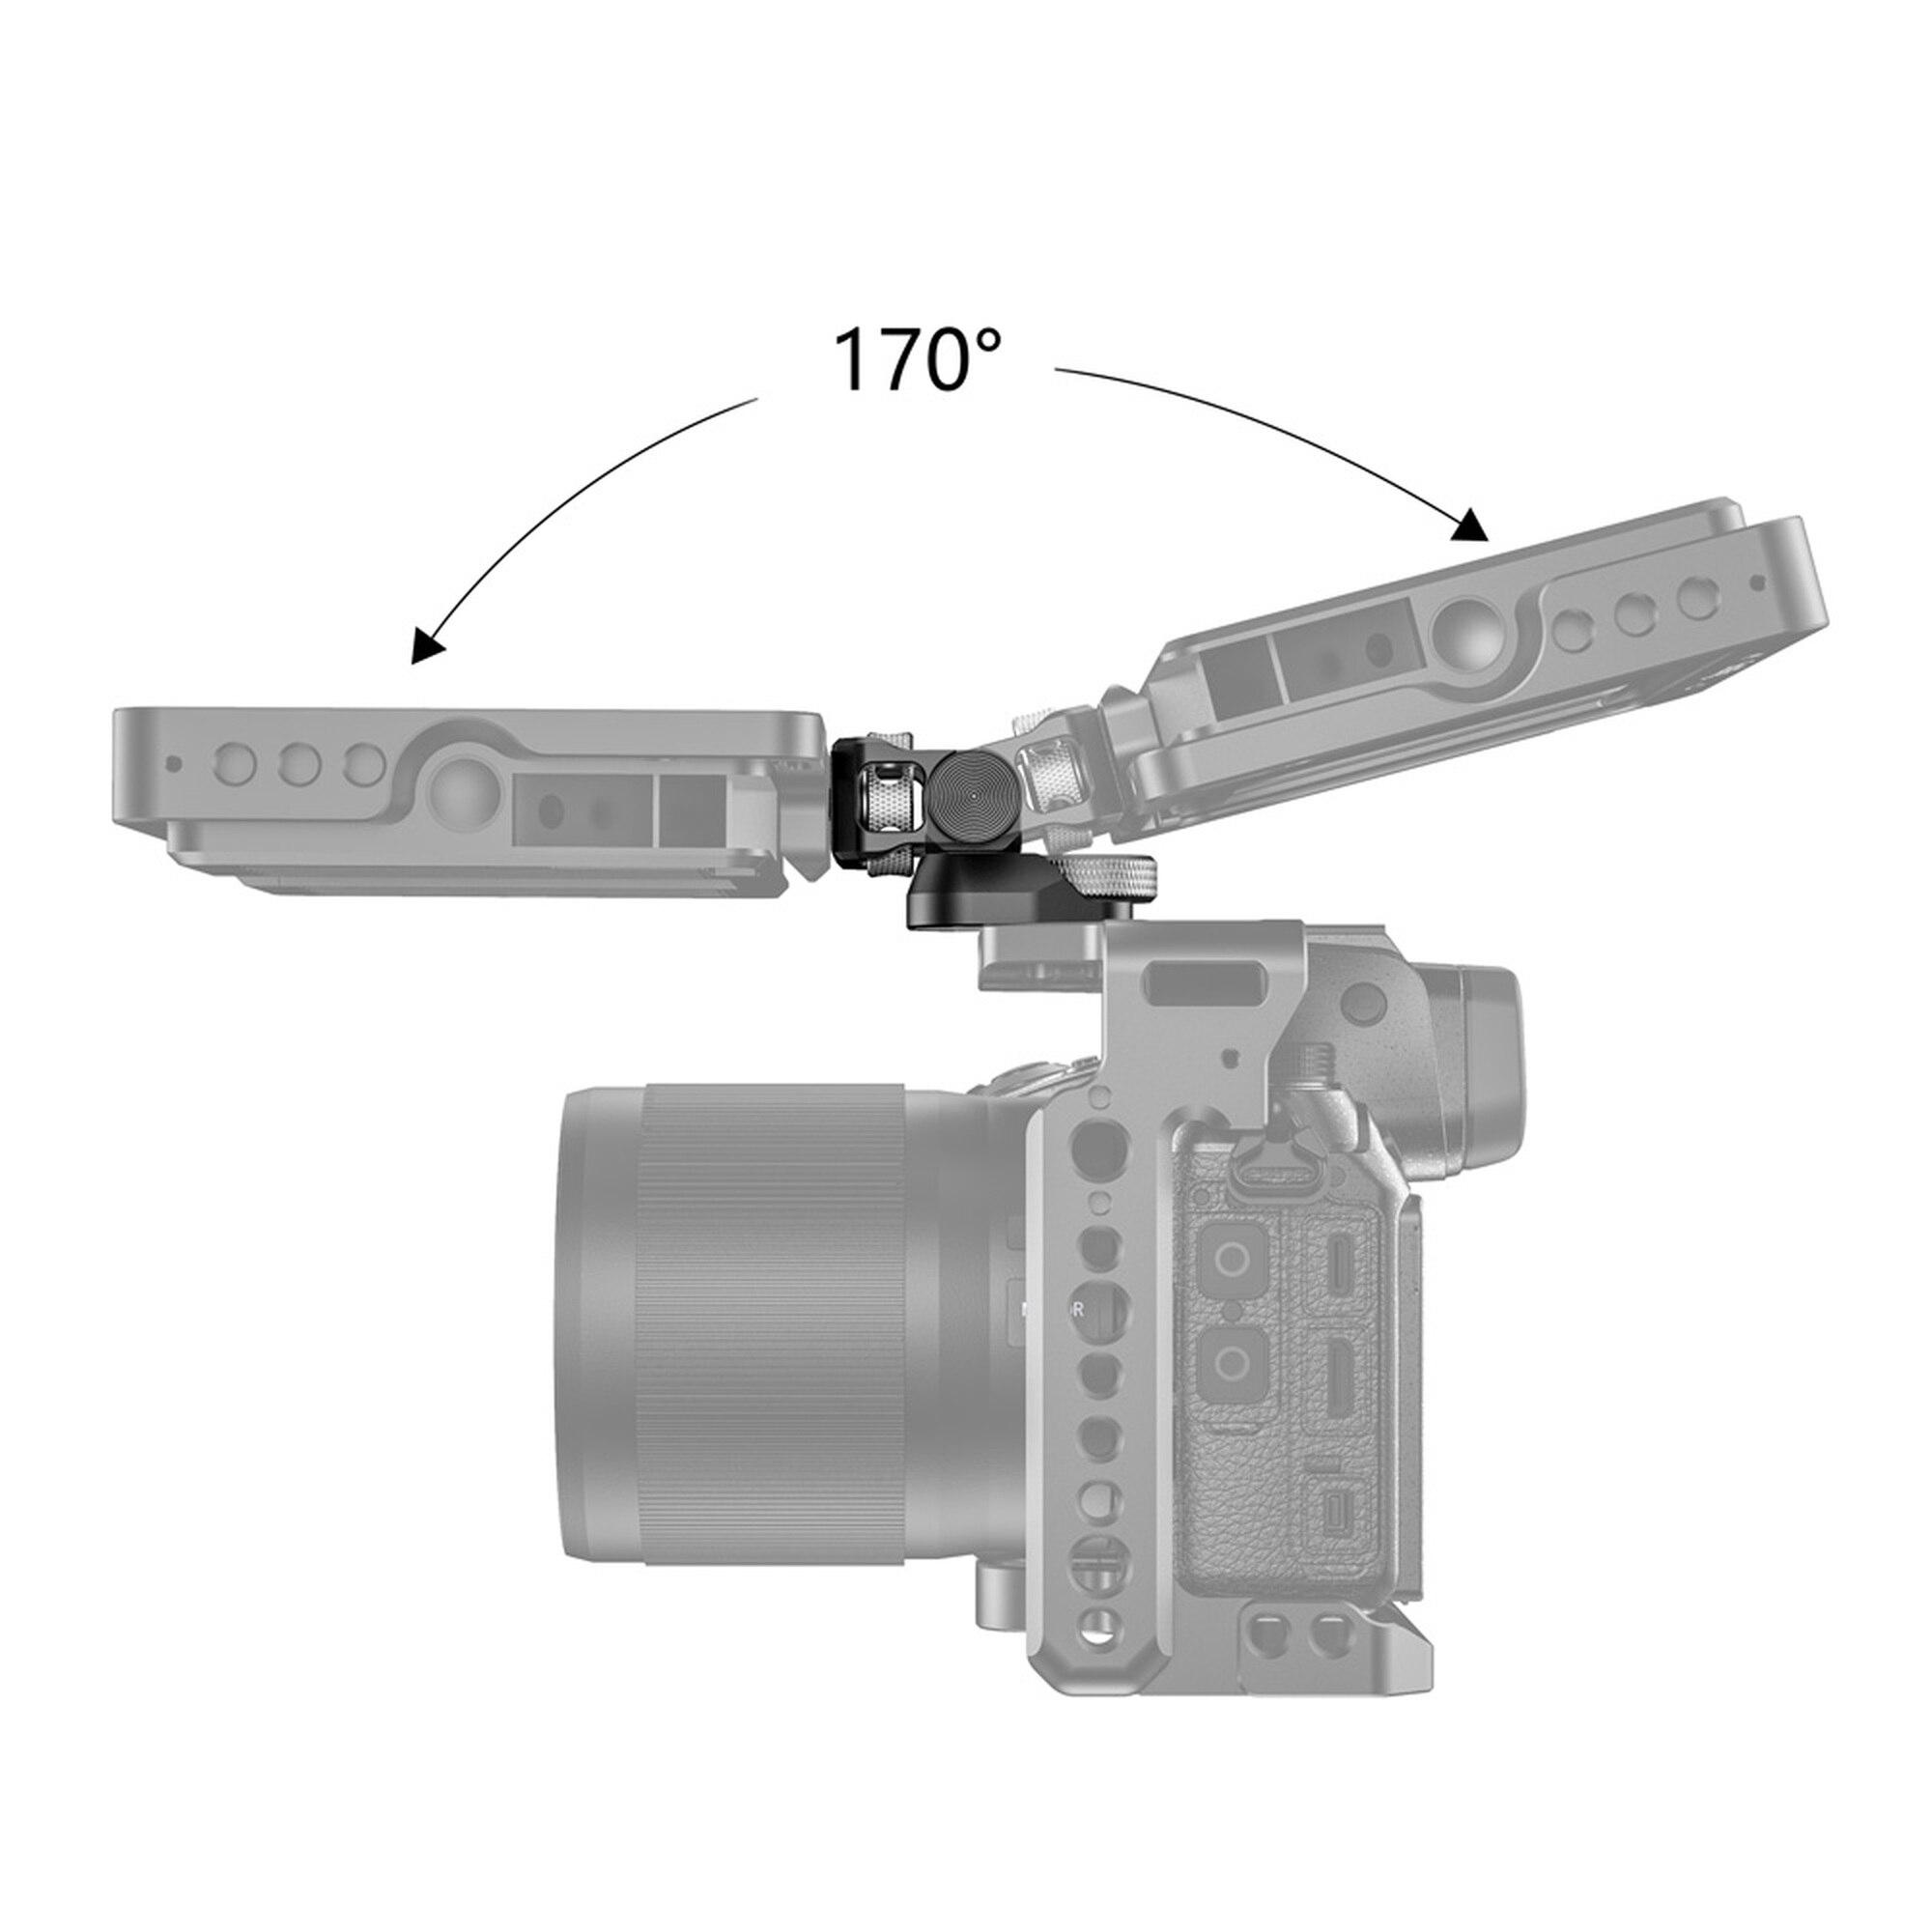 SmallRig Swivel 170 Degree & Tilt 360 Degree Monitor Mount with Arri Locating Pins Microphone Bracket Camera EVF Mount BSE2348 enlarge